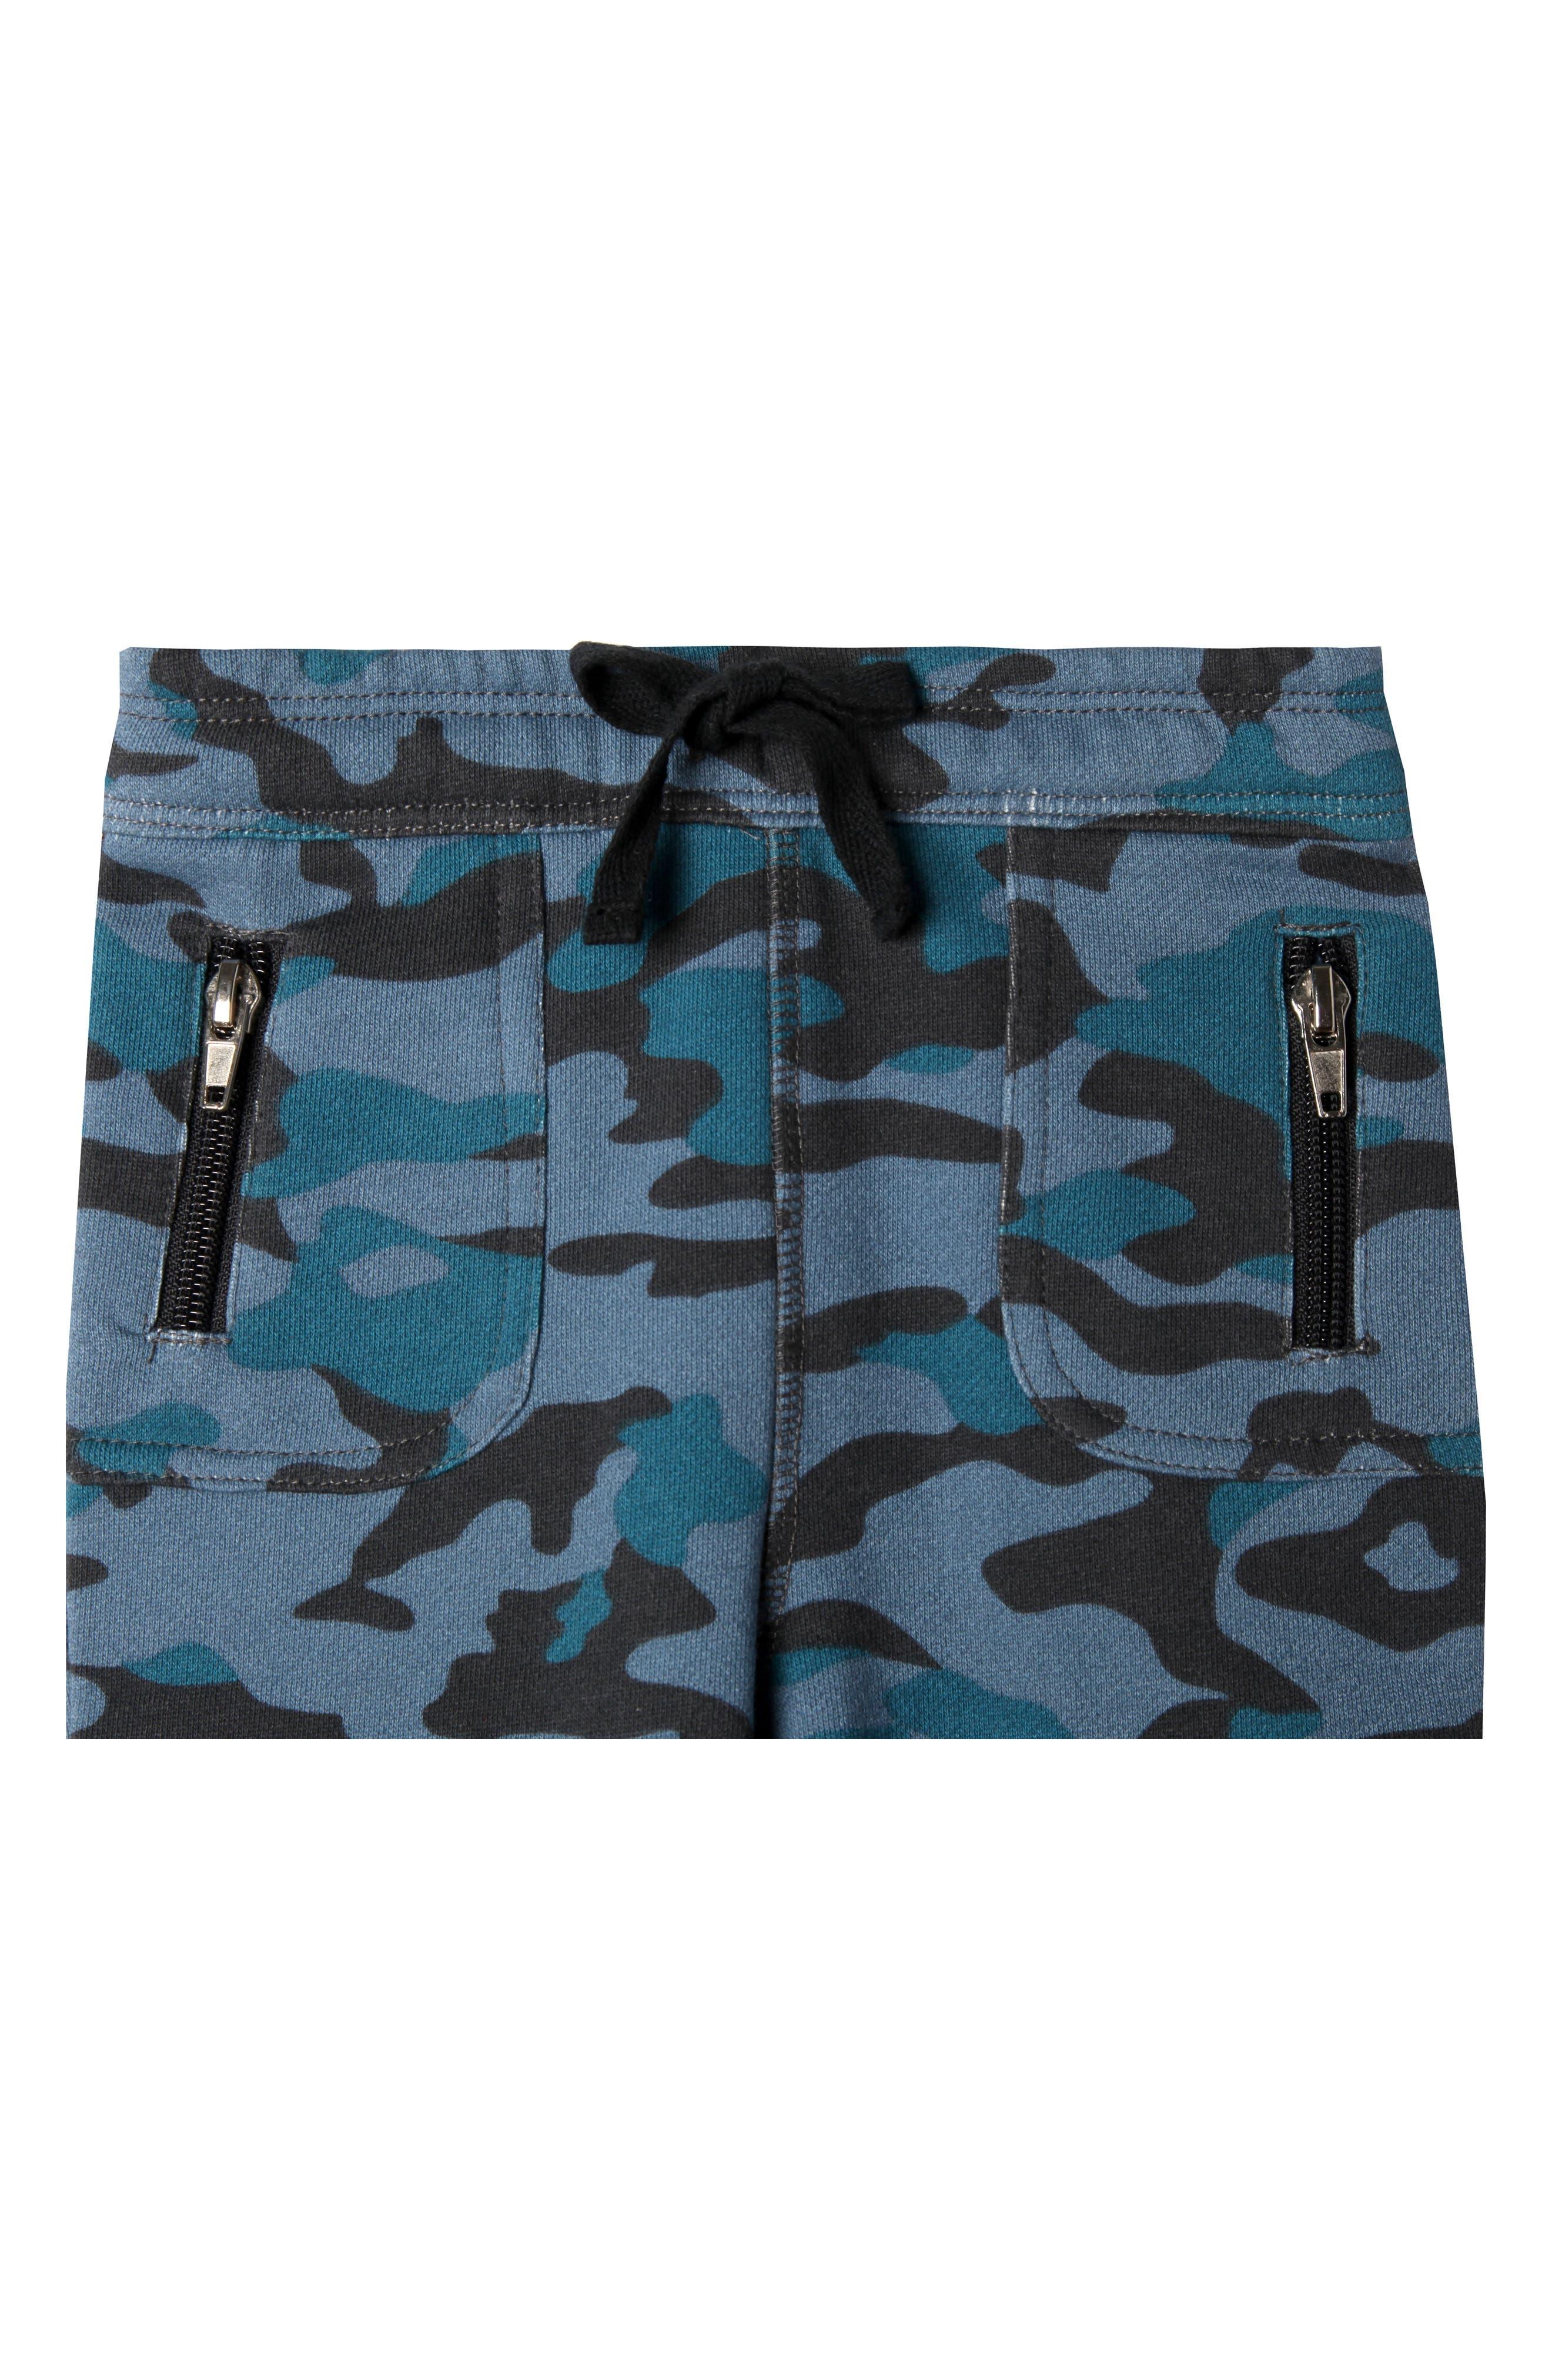 Grand Organic Cotton Jogger Pants,                             Alternate thumbnail 2, color,                             Navy Camo